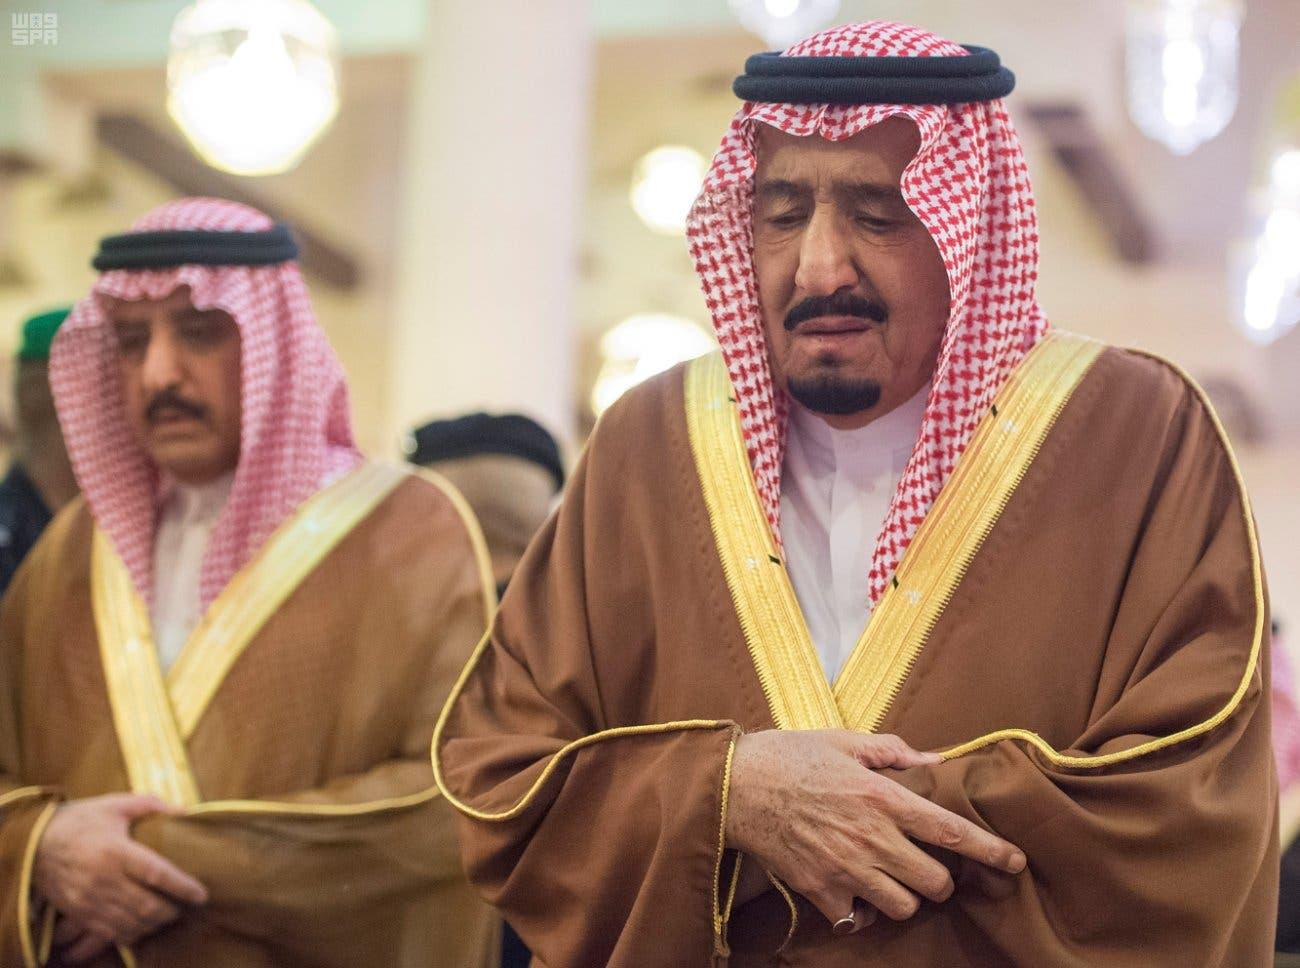 In photos: Saudi King Salman in tears, leads brother's funeral - Al